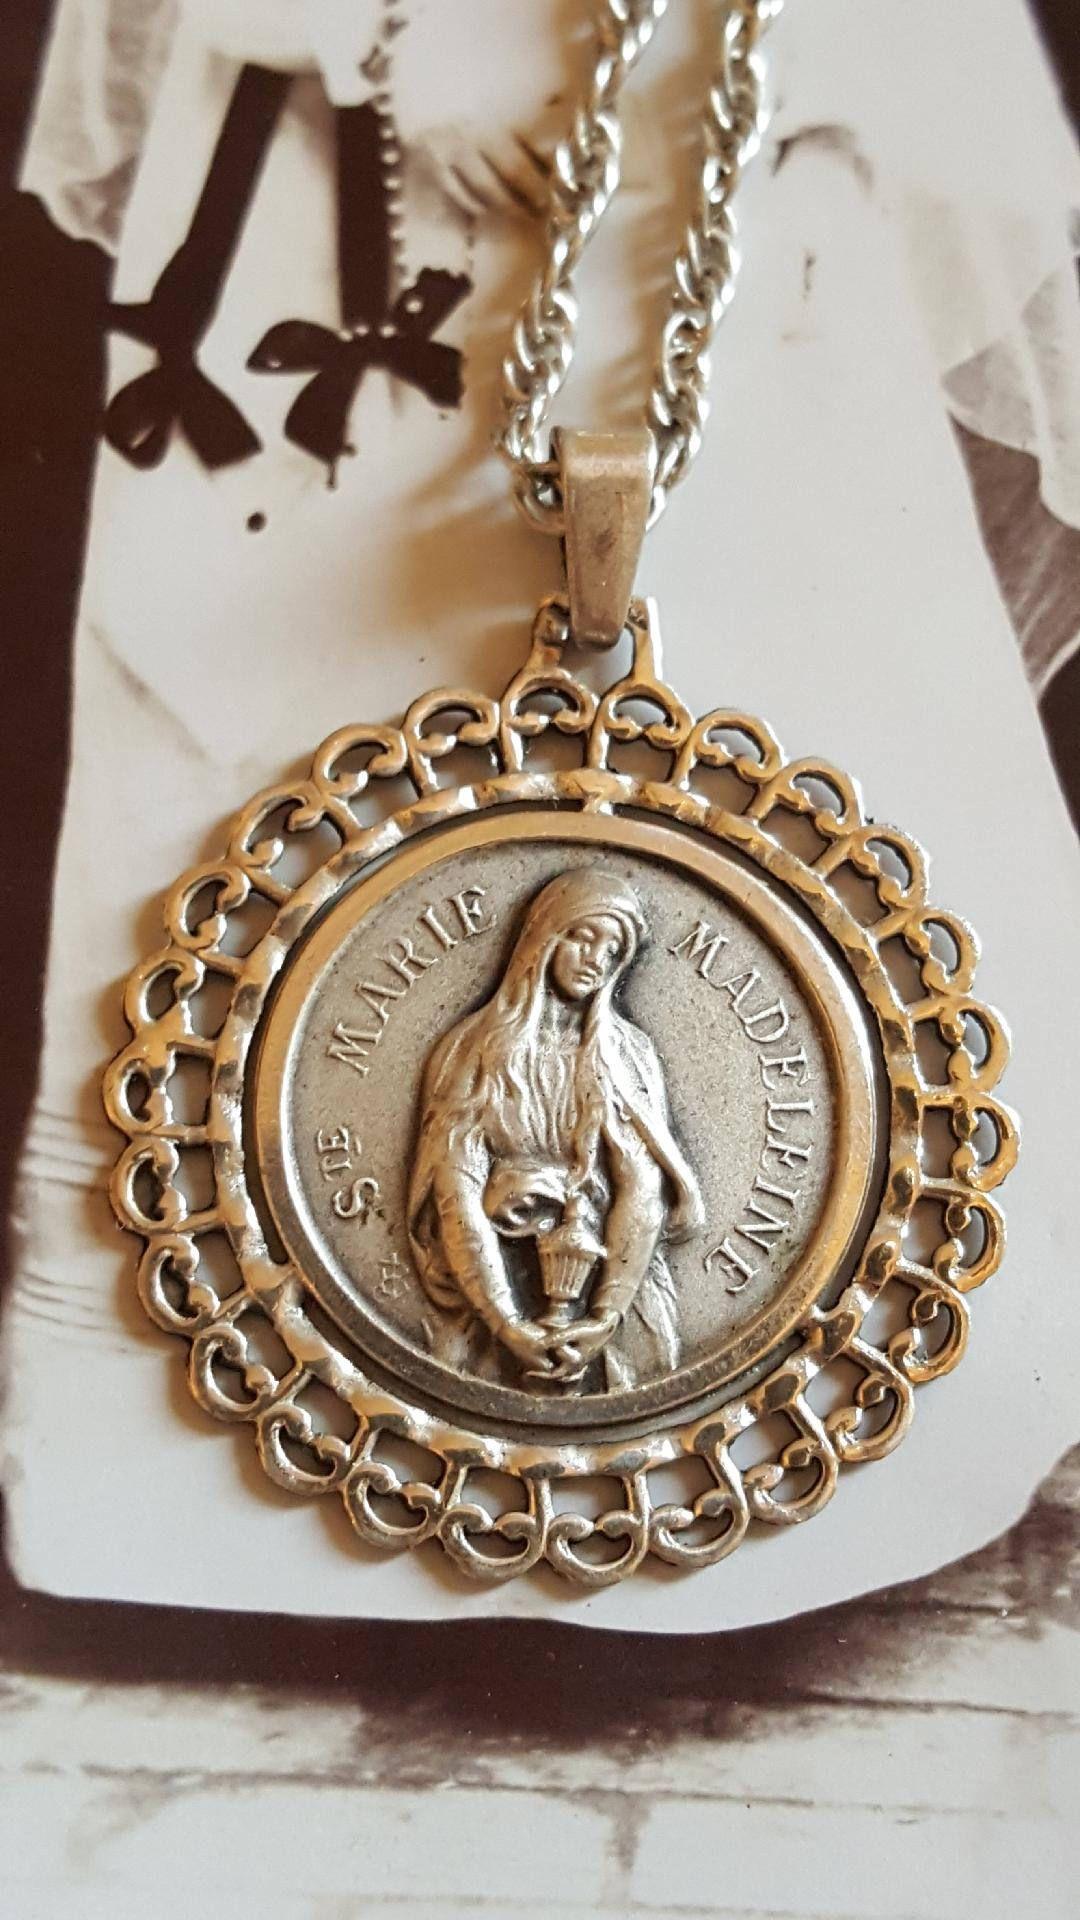 Vintage french silver saint mary magdalene medal necklace catholic vintage french silver saint mary magdalene medal necklace catholic jewelry religious gift christian amulet talisman mozeypictures Choice Image